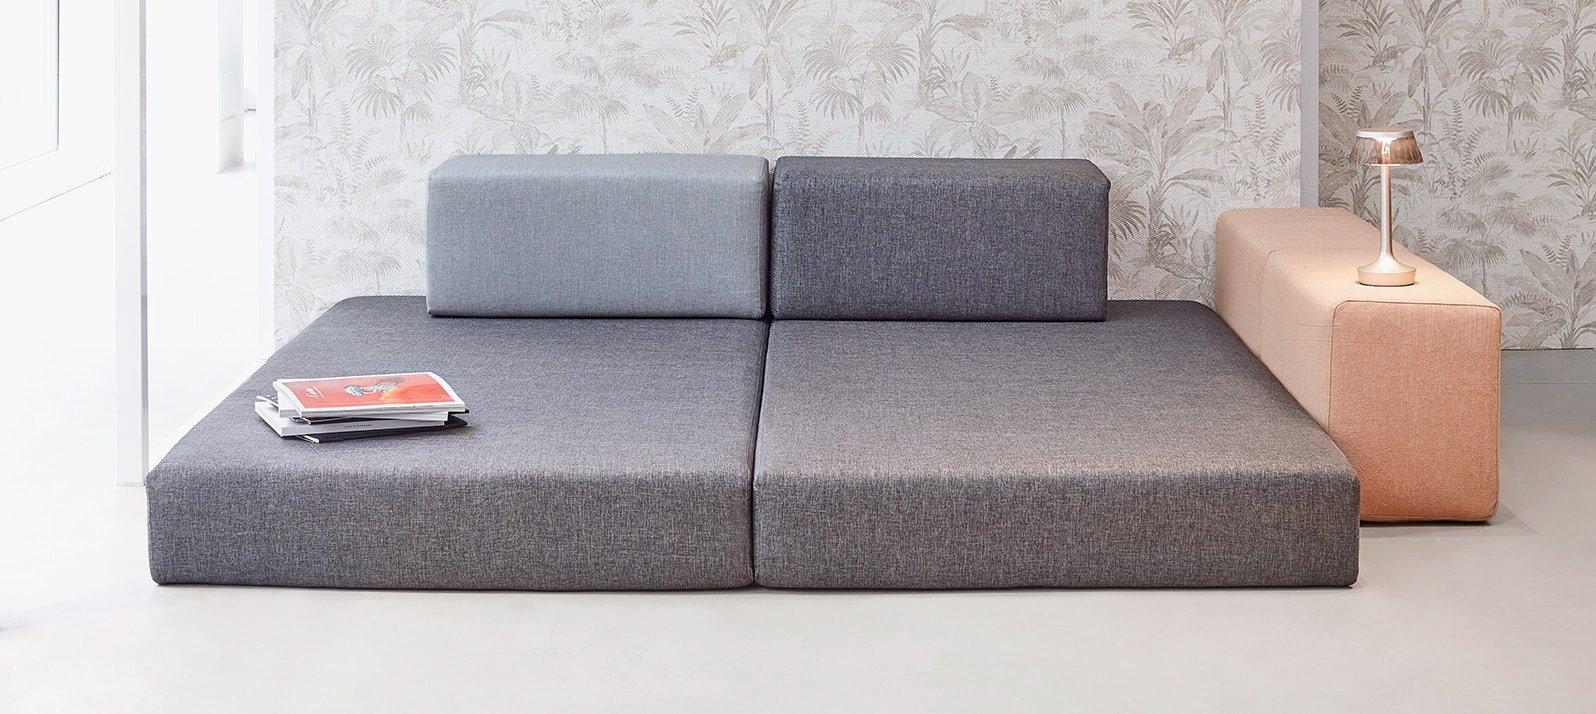 Rodolfo, the geometric modular sofa made for you